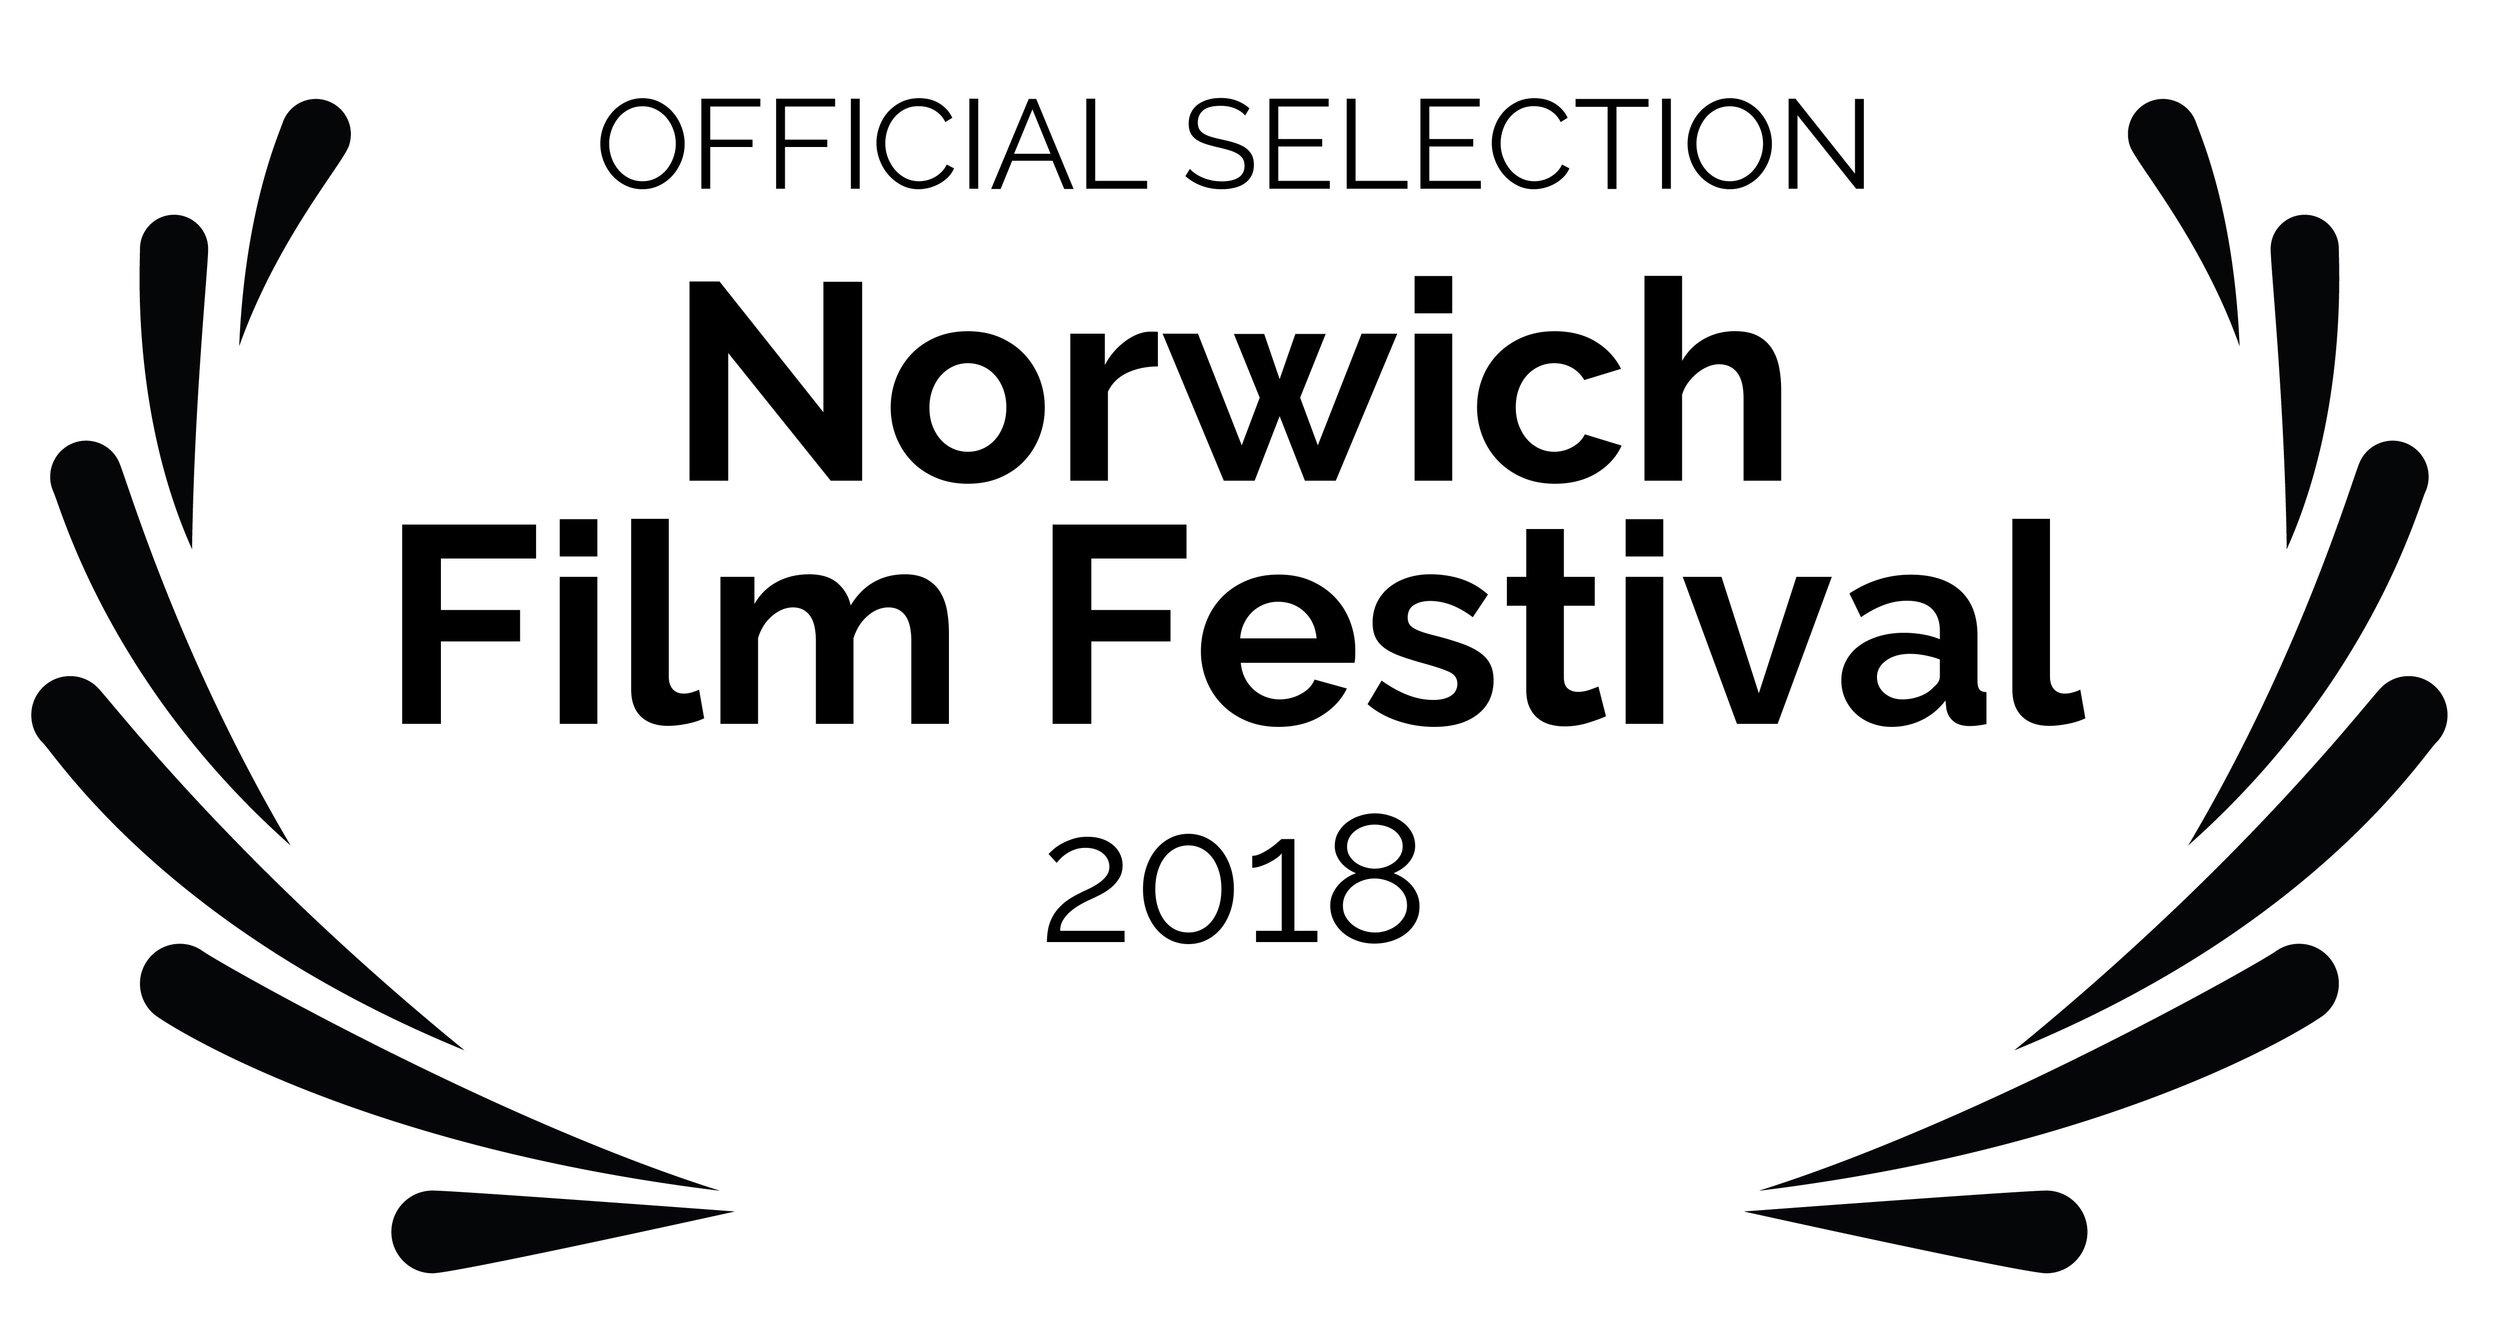 OFFICIALSELECTION-NorwichFilmFestival-2018.jpg